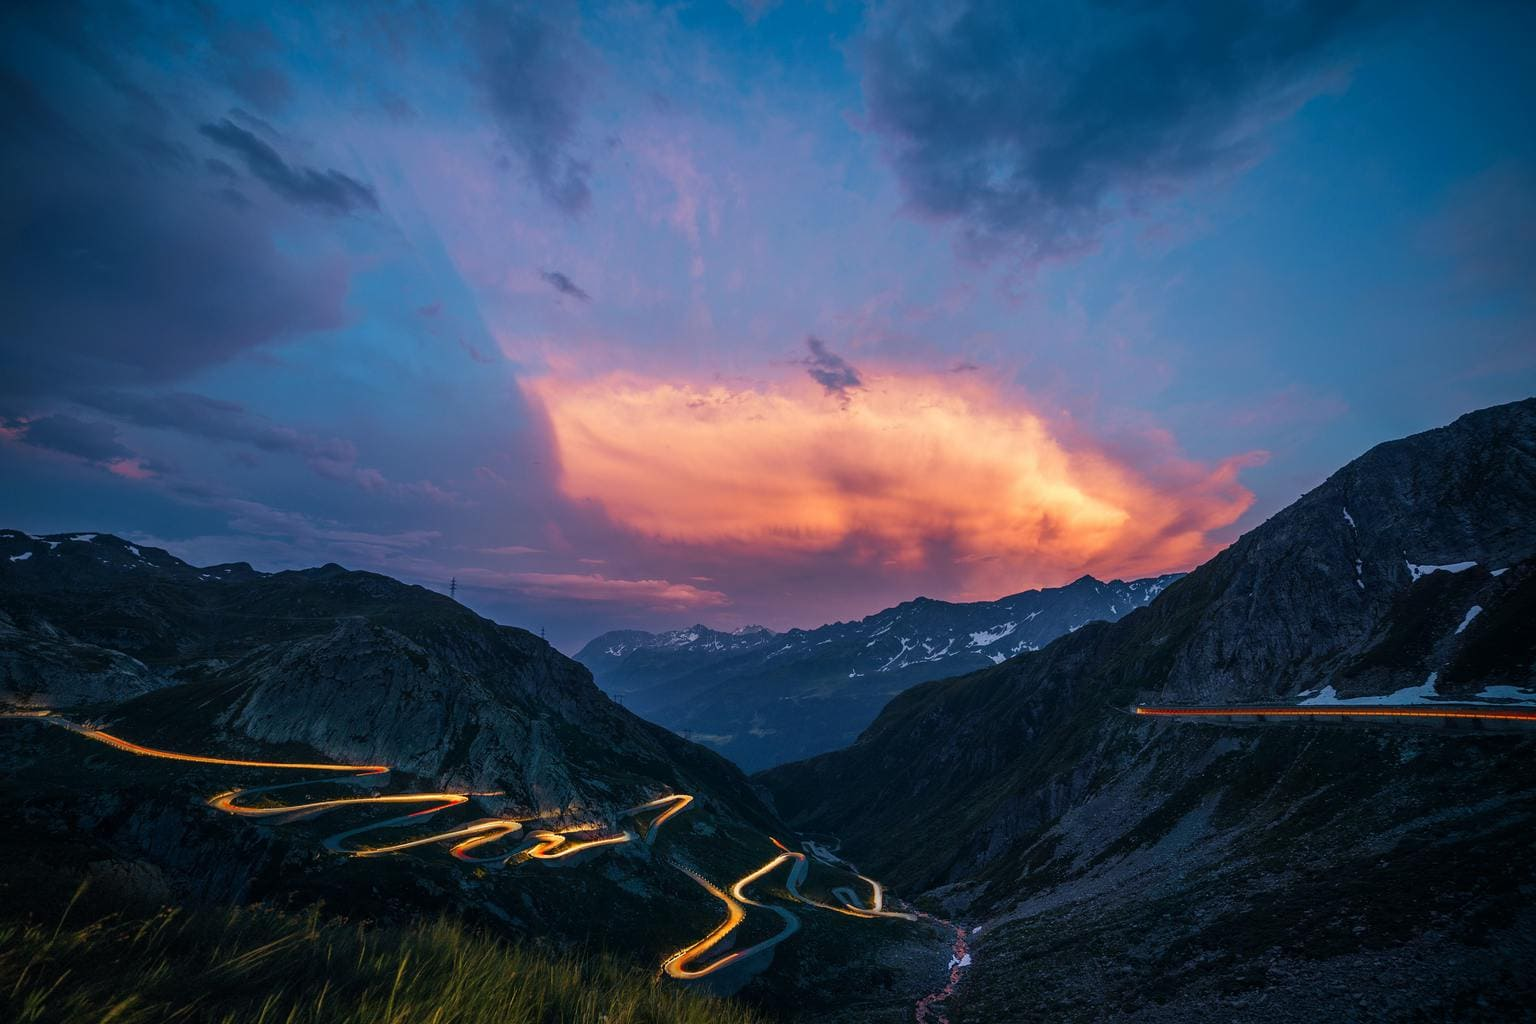 Estelas de luz en montañas con cielo de atardecer